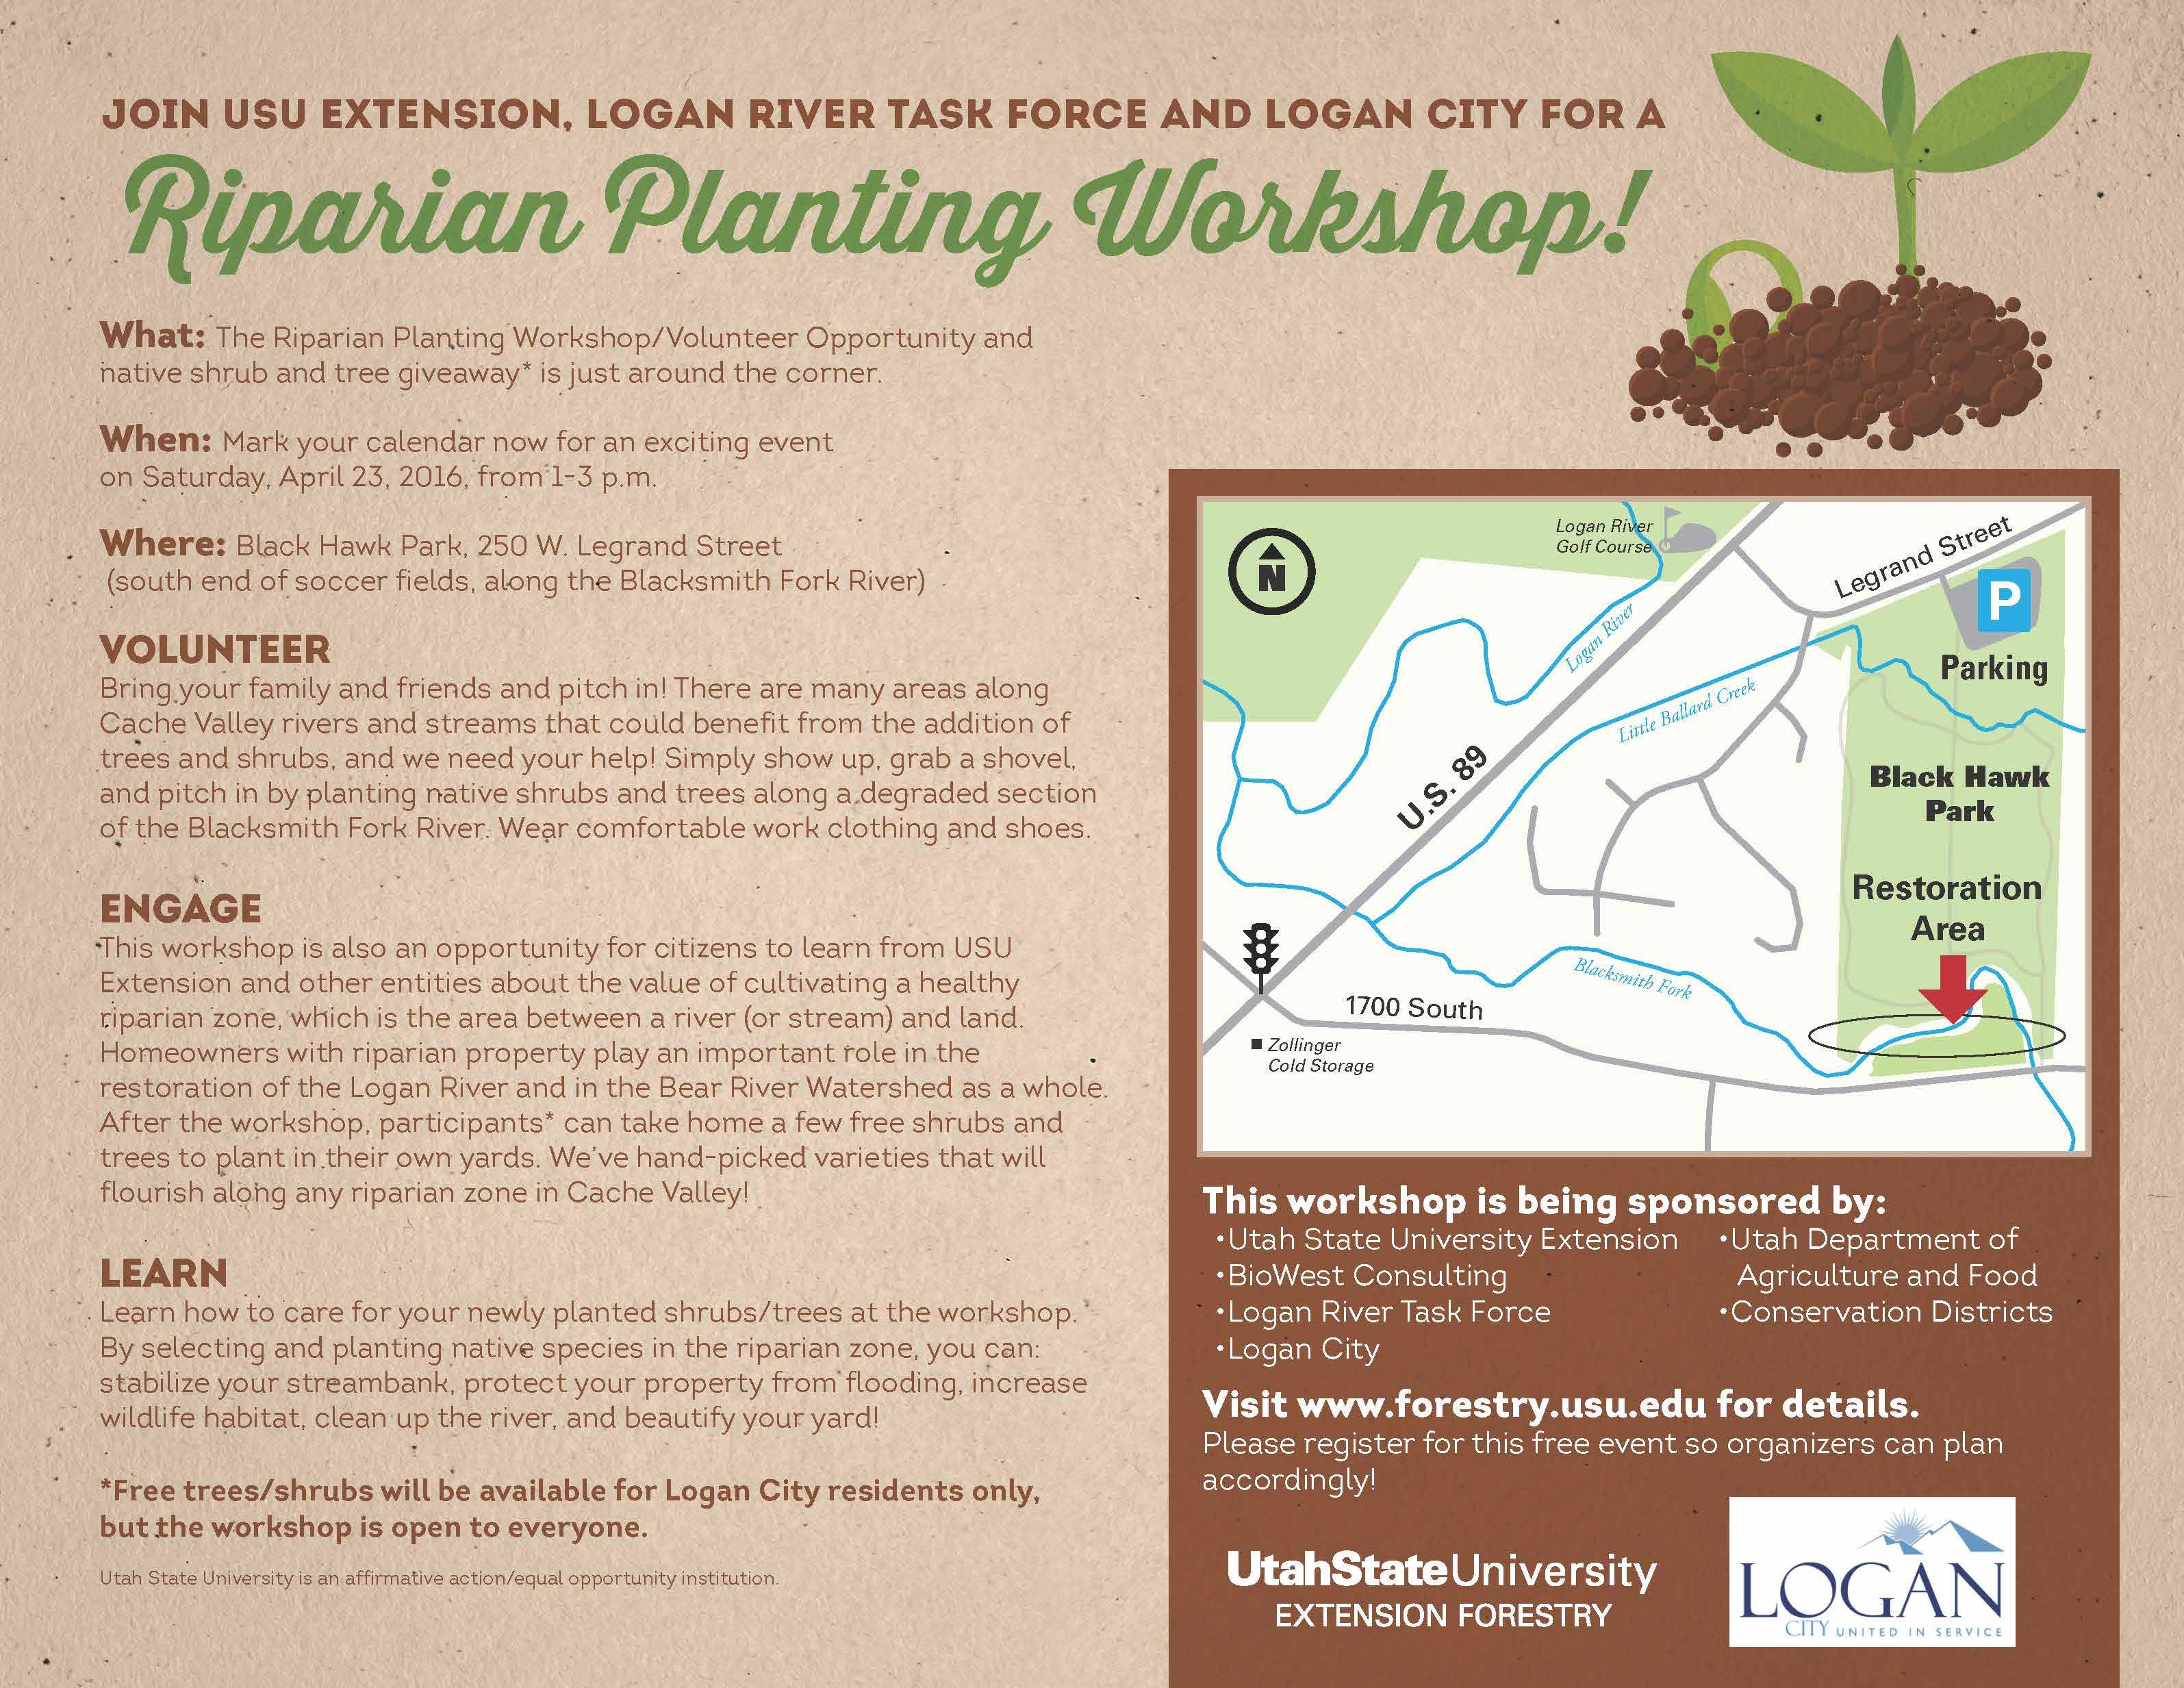 Riparian Planting Workshop, 23 Apr 2016